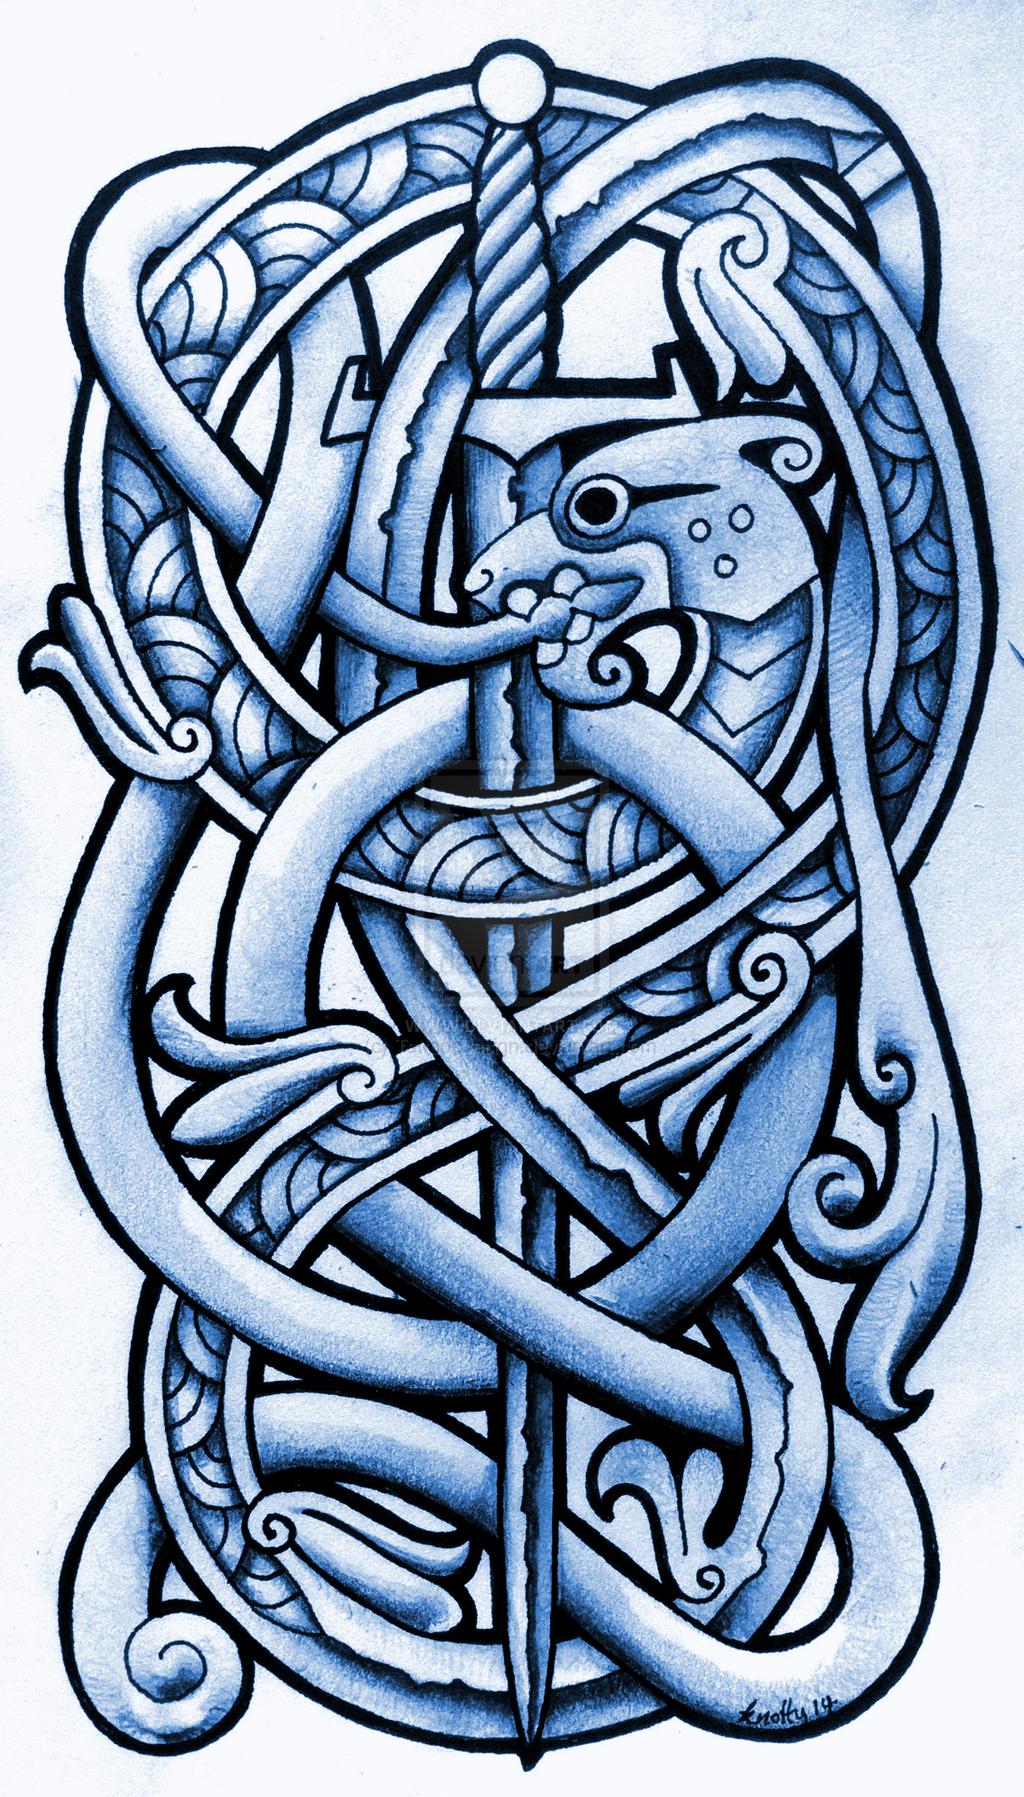 sea serpent and broadsword by tattoodesigndeviantartcom